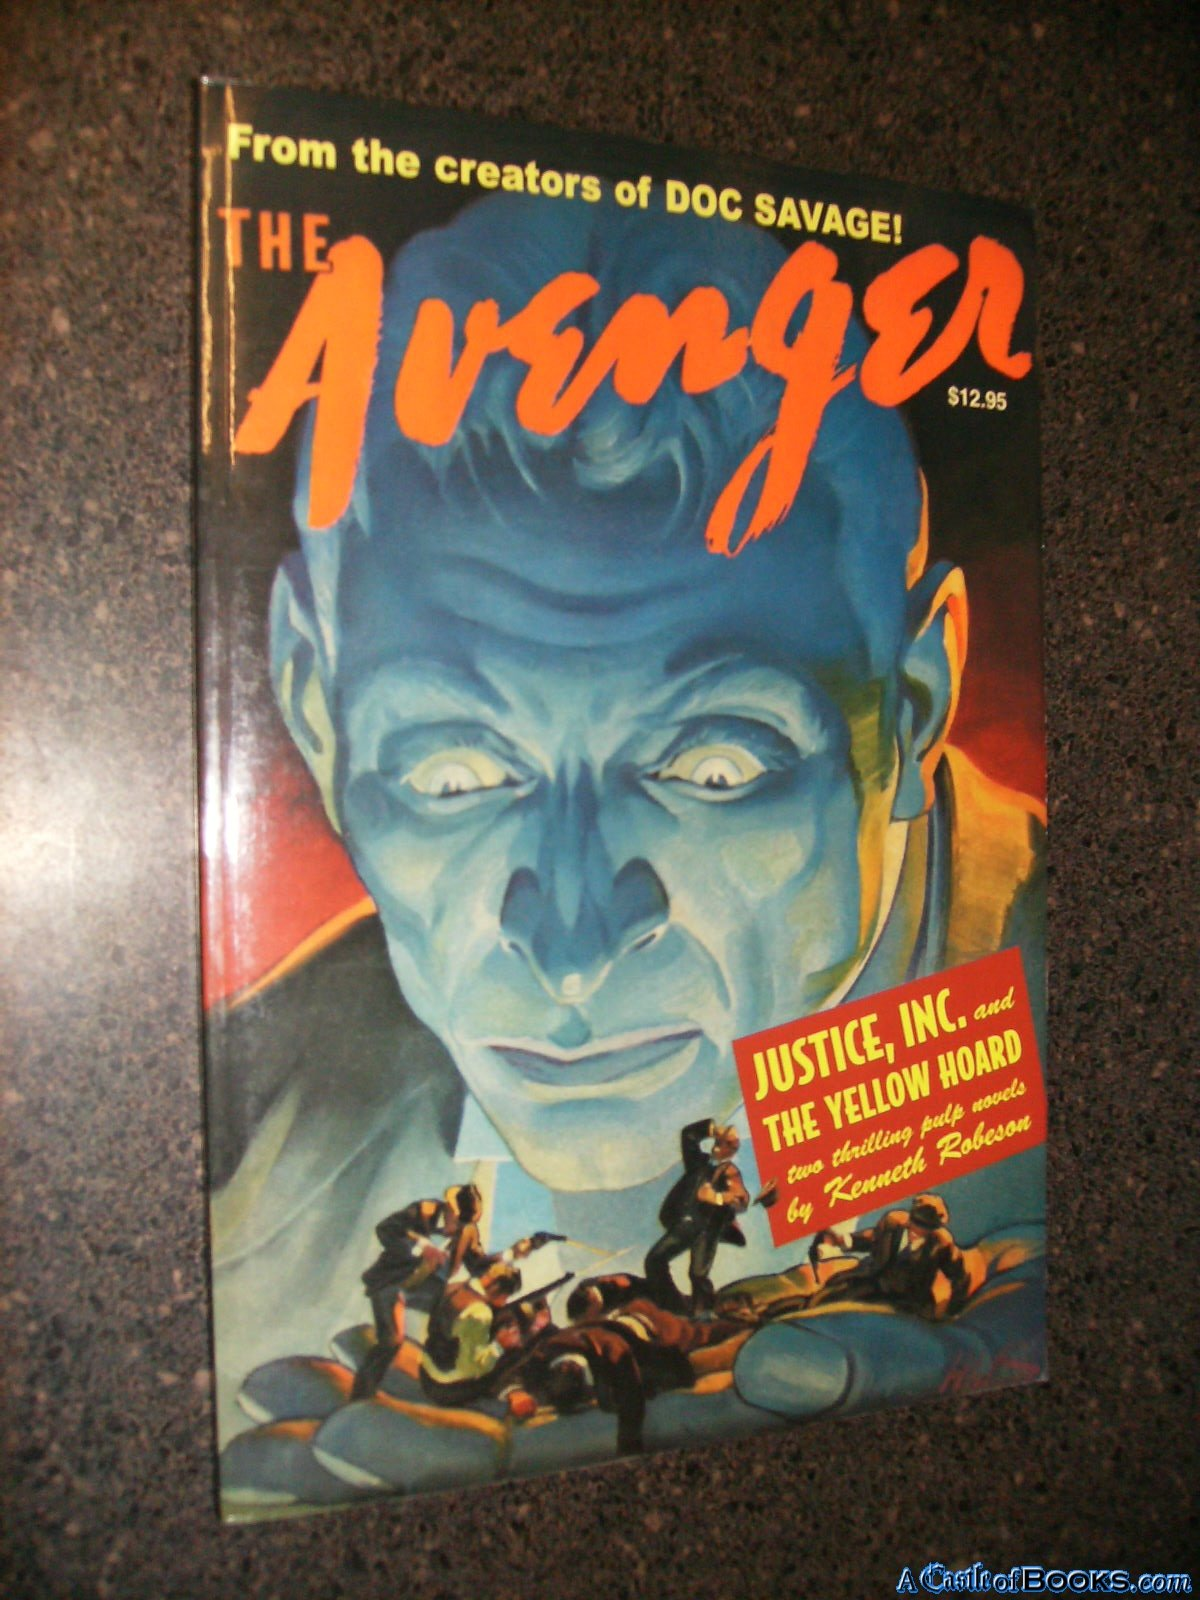 Download THE AVENGER #1 (DOUBLE) (1) pdf epub